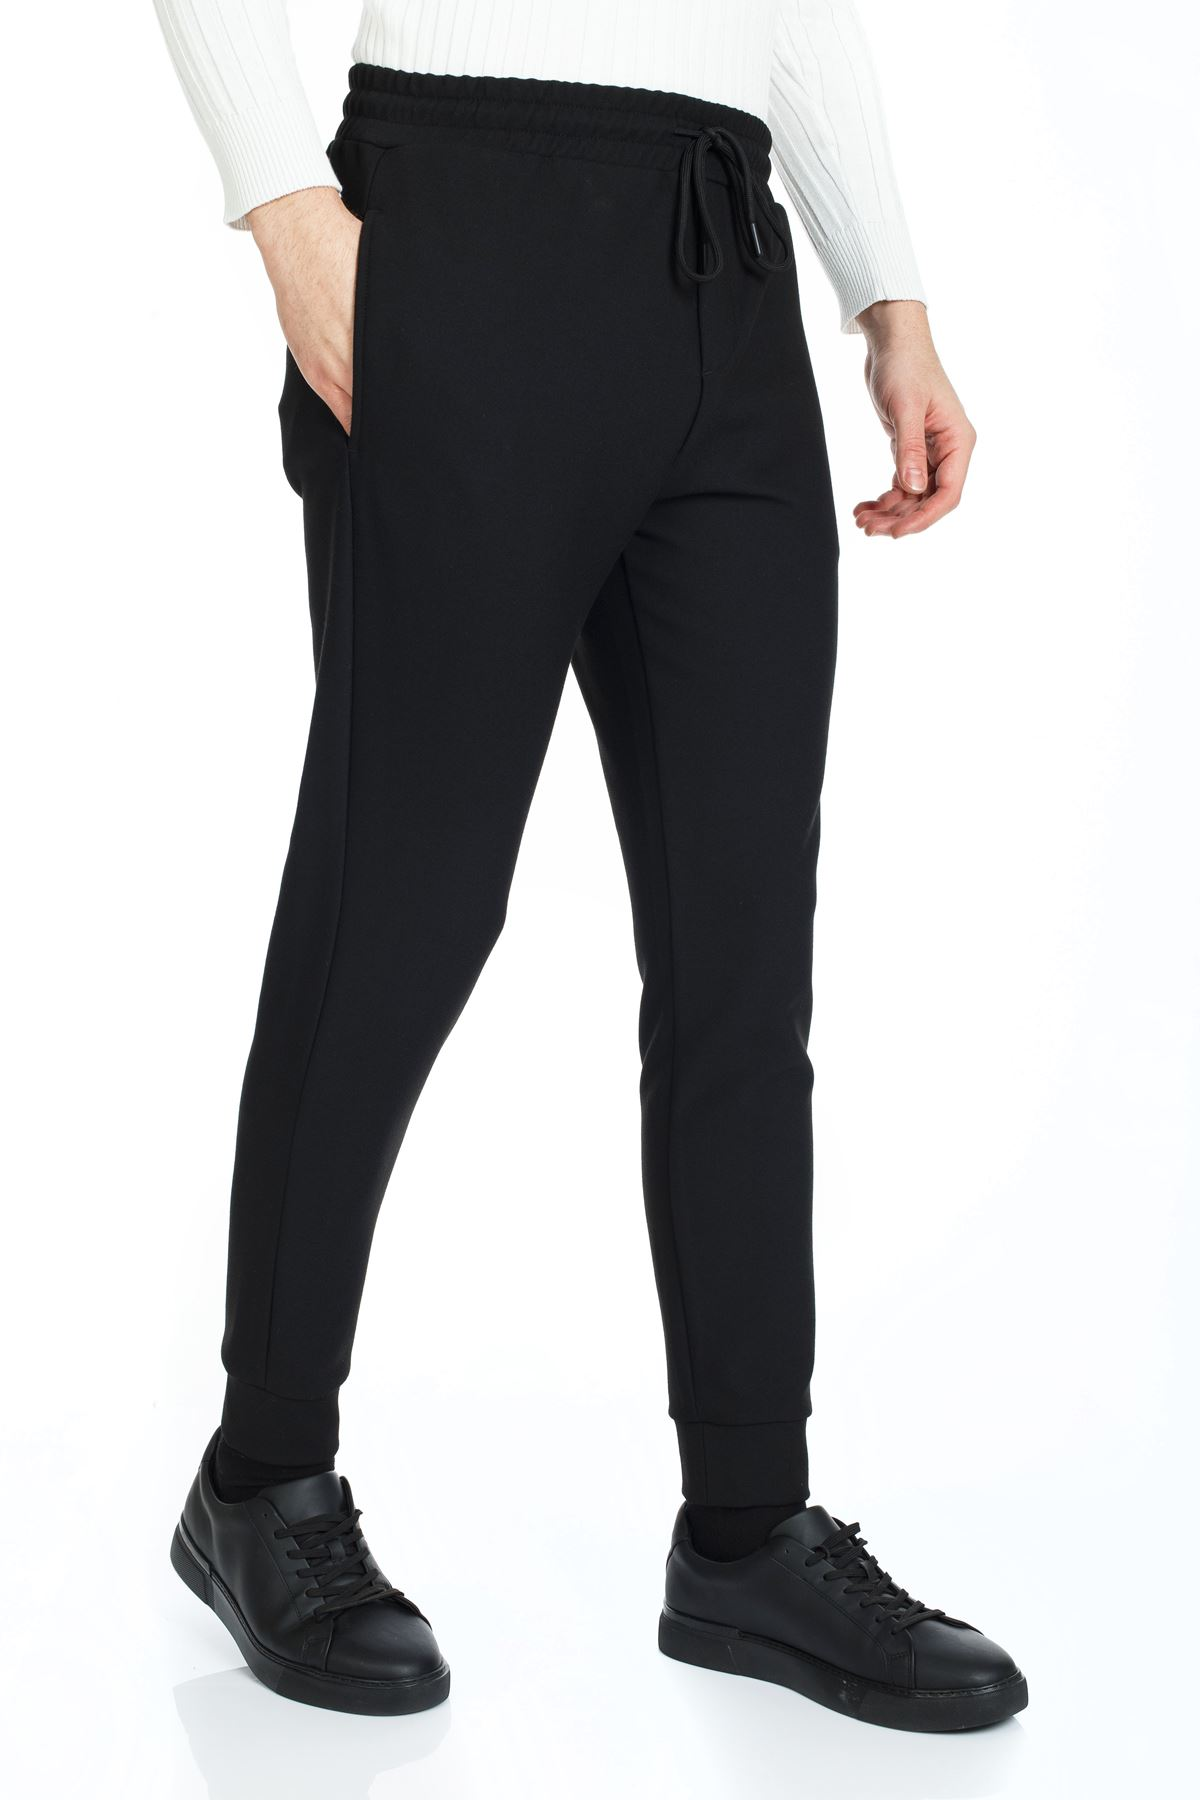 Siyah  Paça Lastikli İpli Slim Kalıp Jogger Pantolon